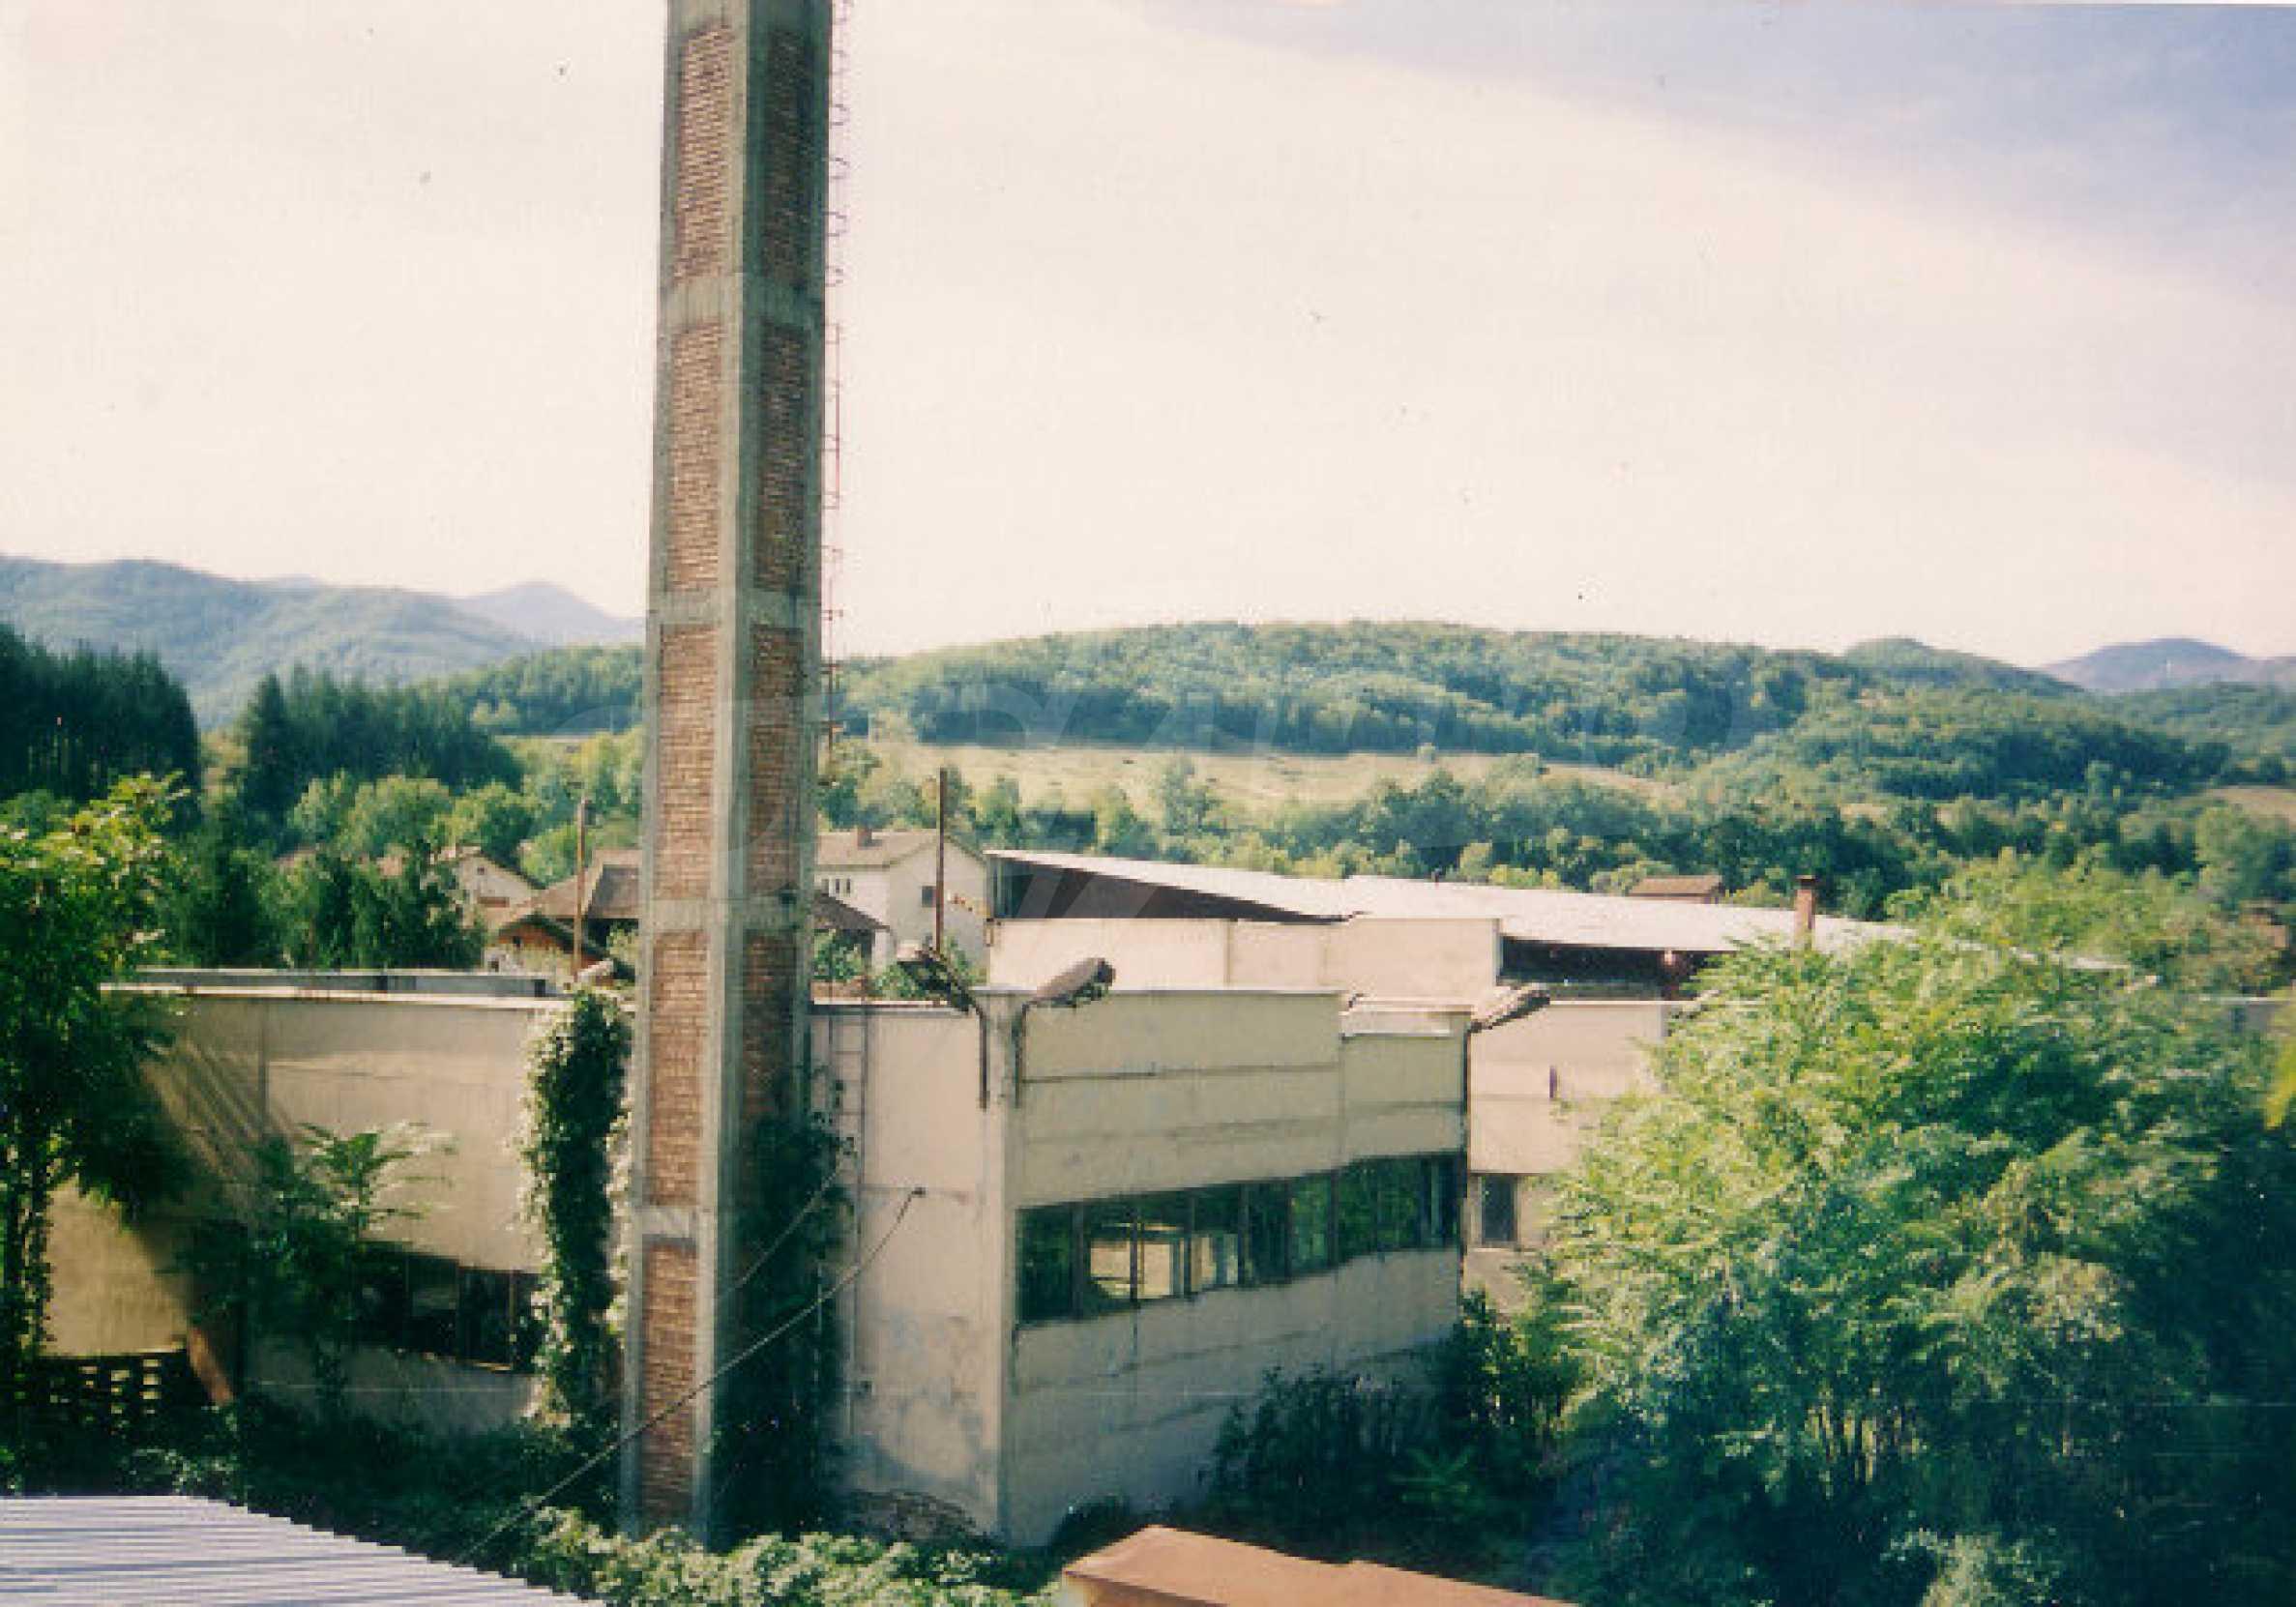 Завод возле города Видин 2